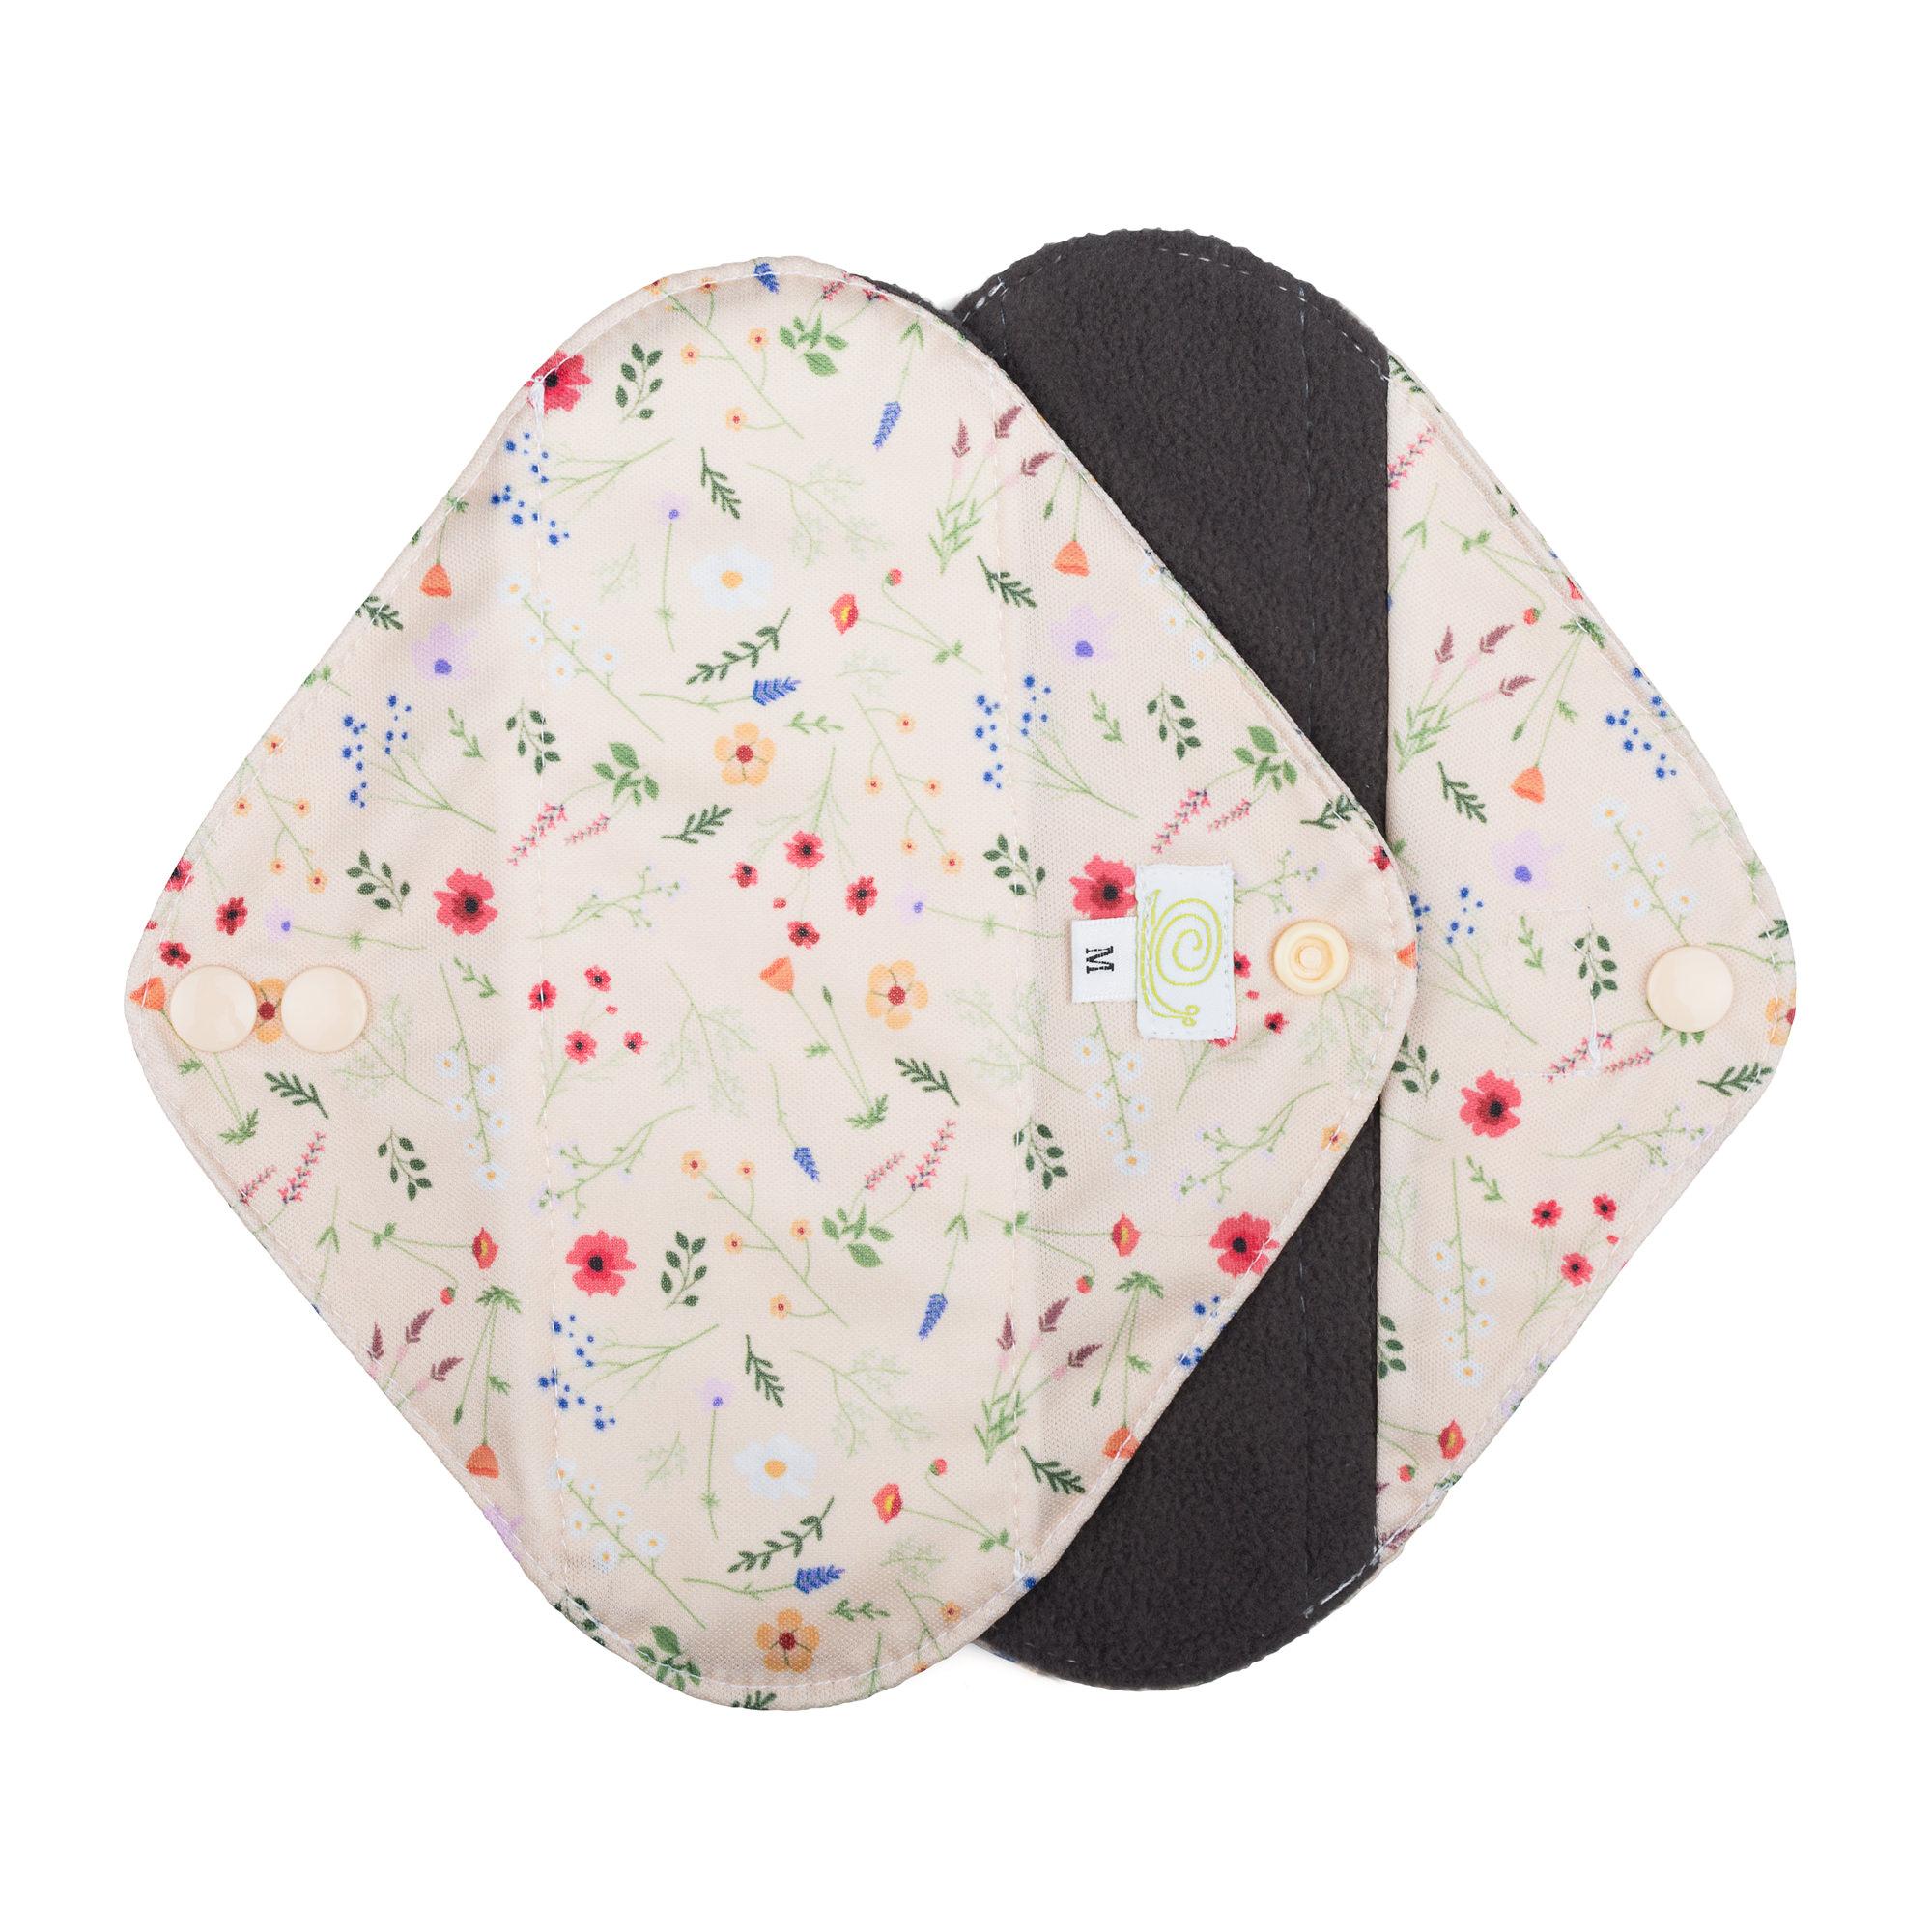 Baba+Boo Wildflowers Medium Sanitary Pads